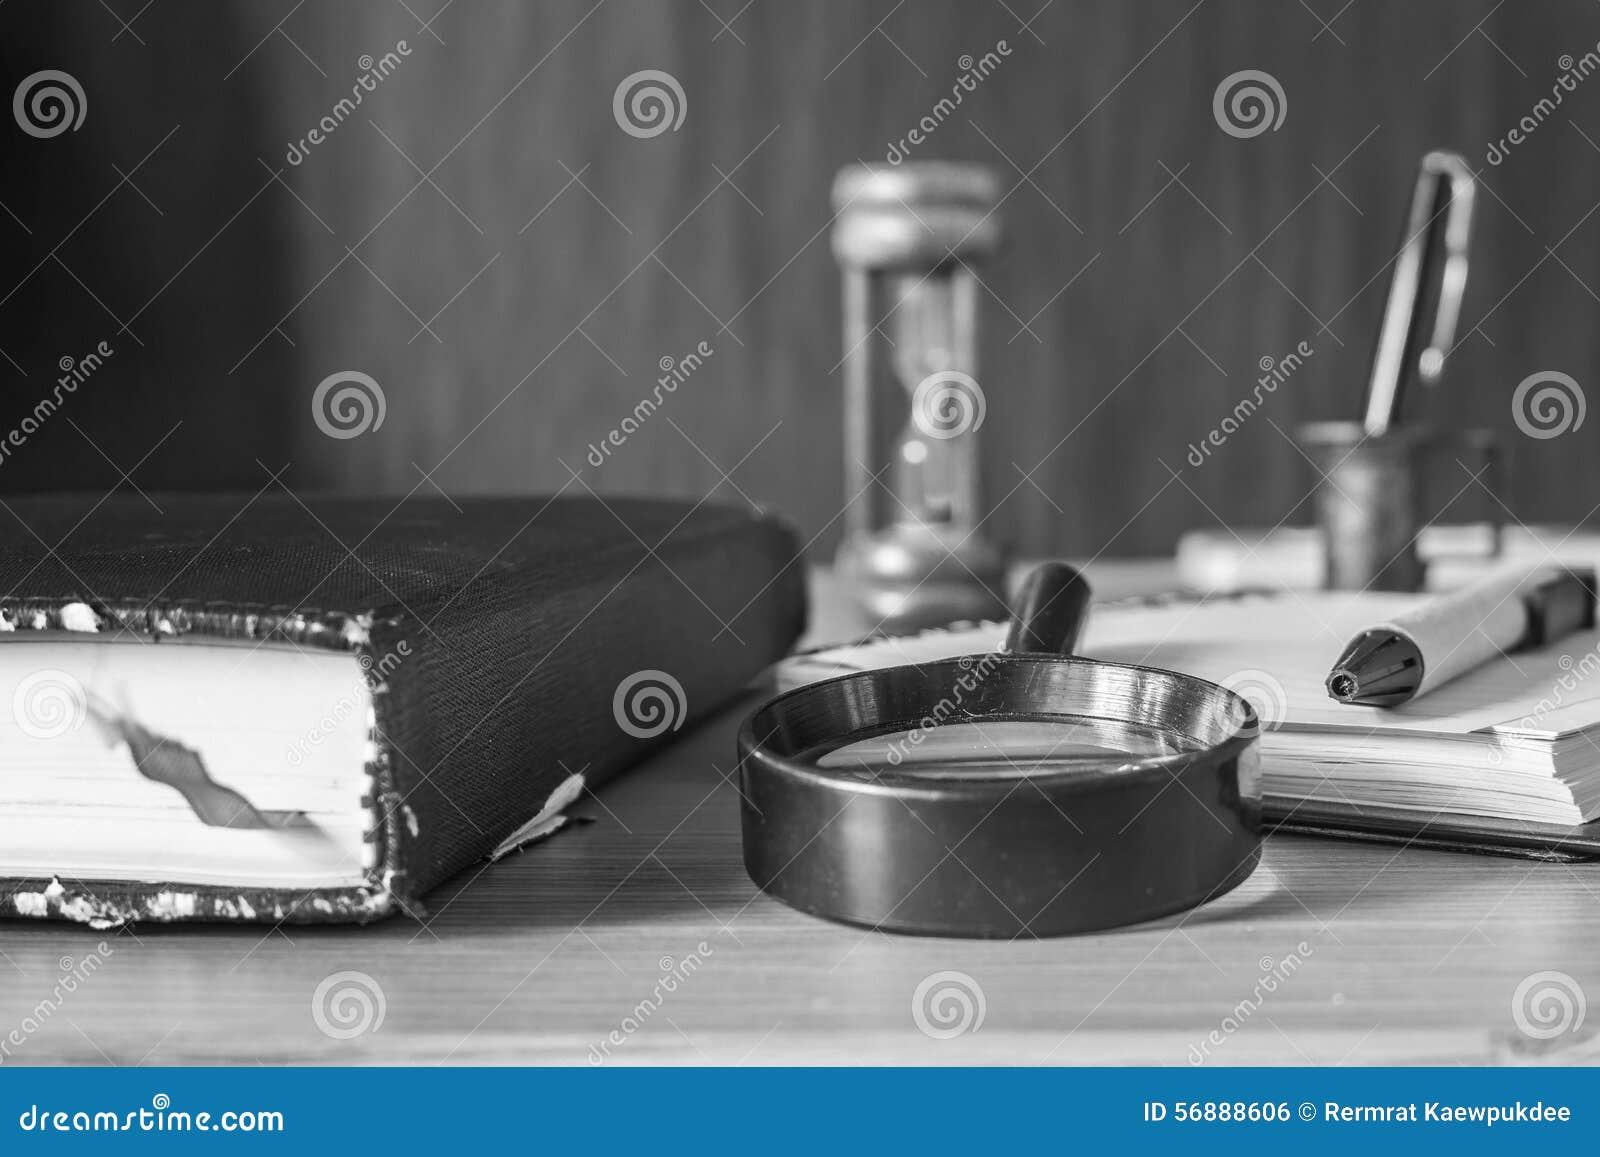 Lente e cancelleria sulla tavola